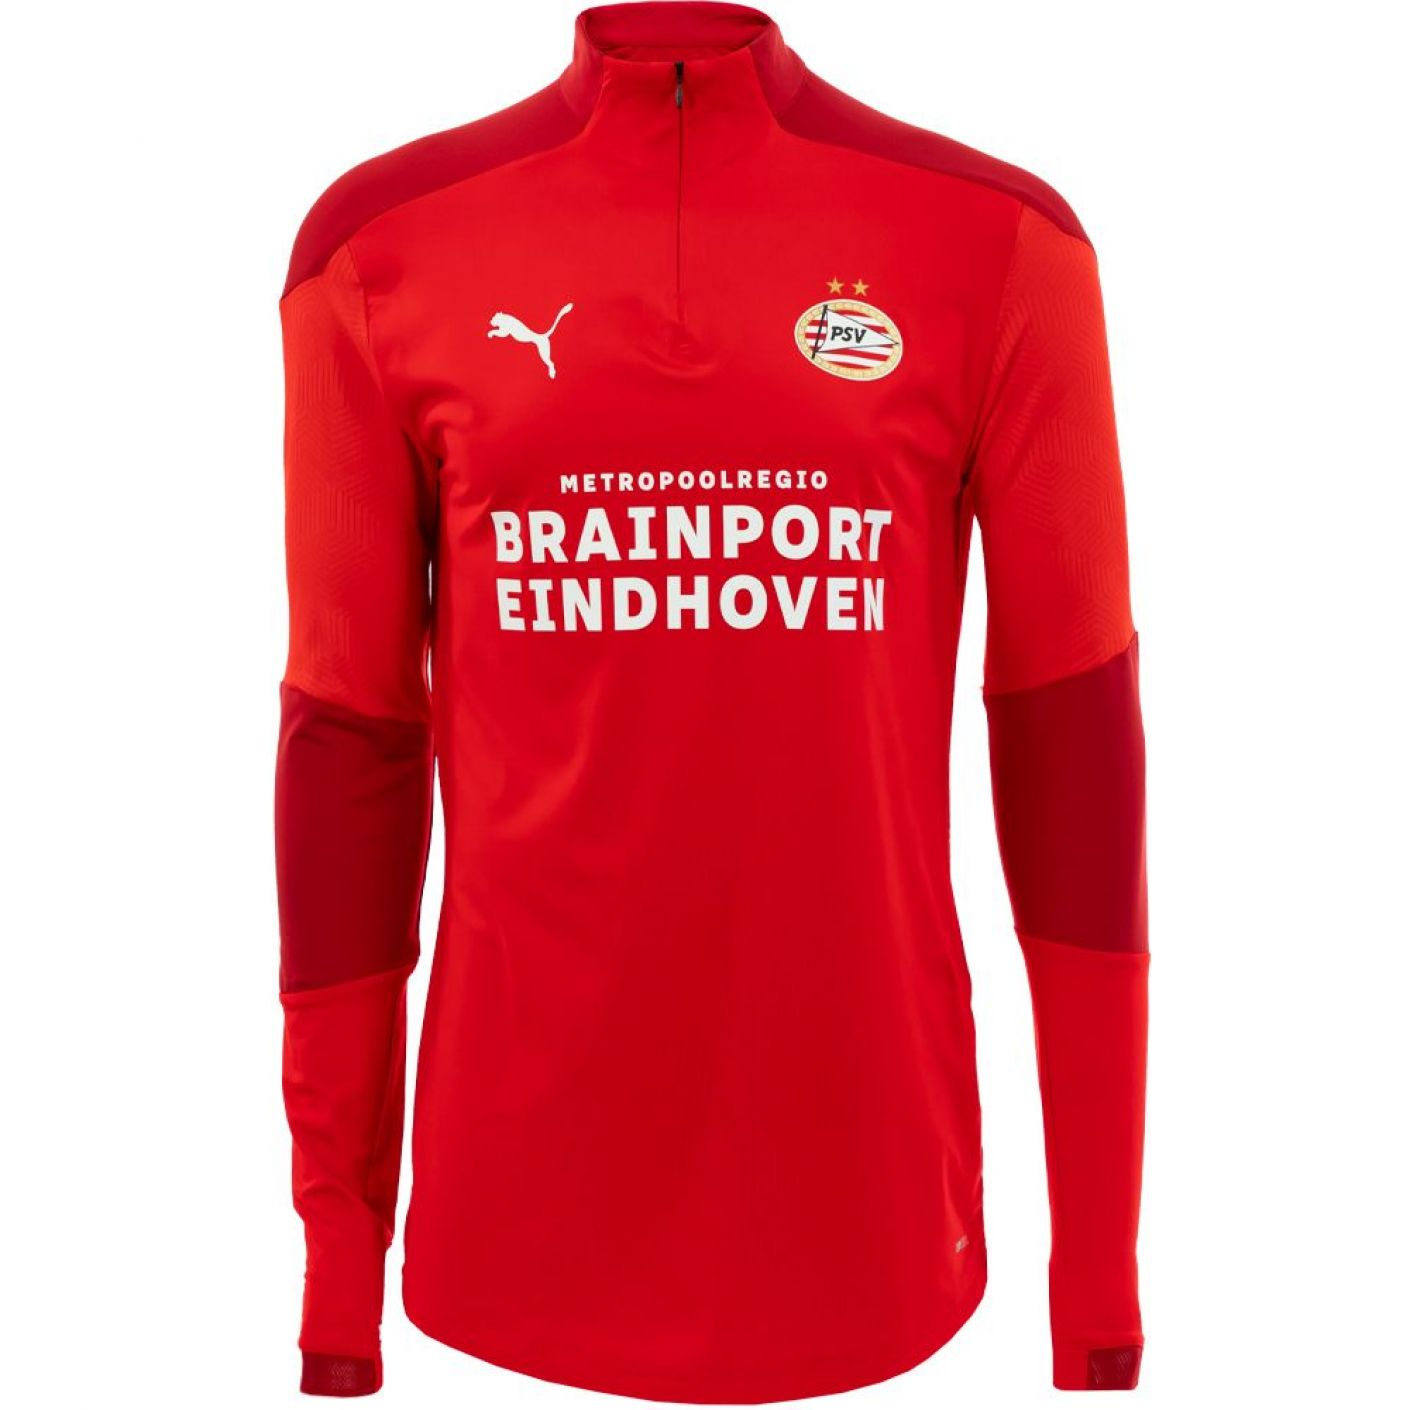 PSV Trainingssweater 1/4 rits 20/21 Rood